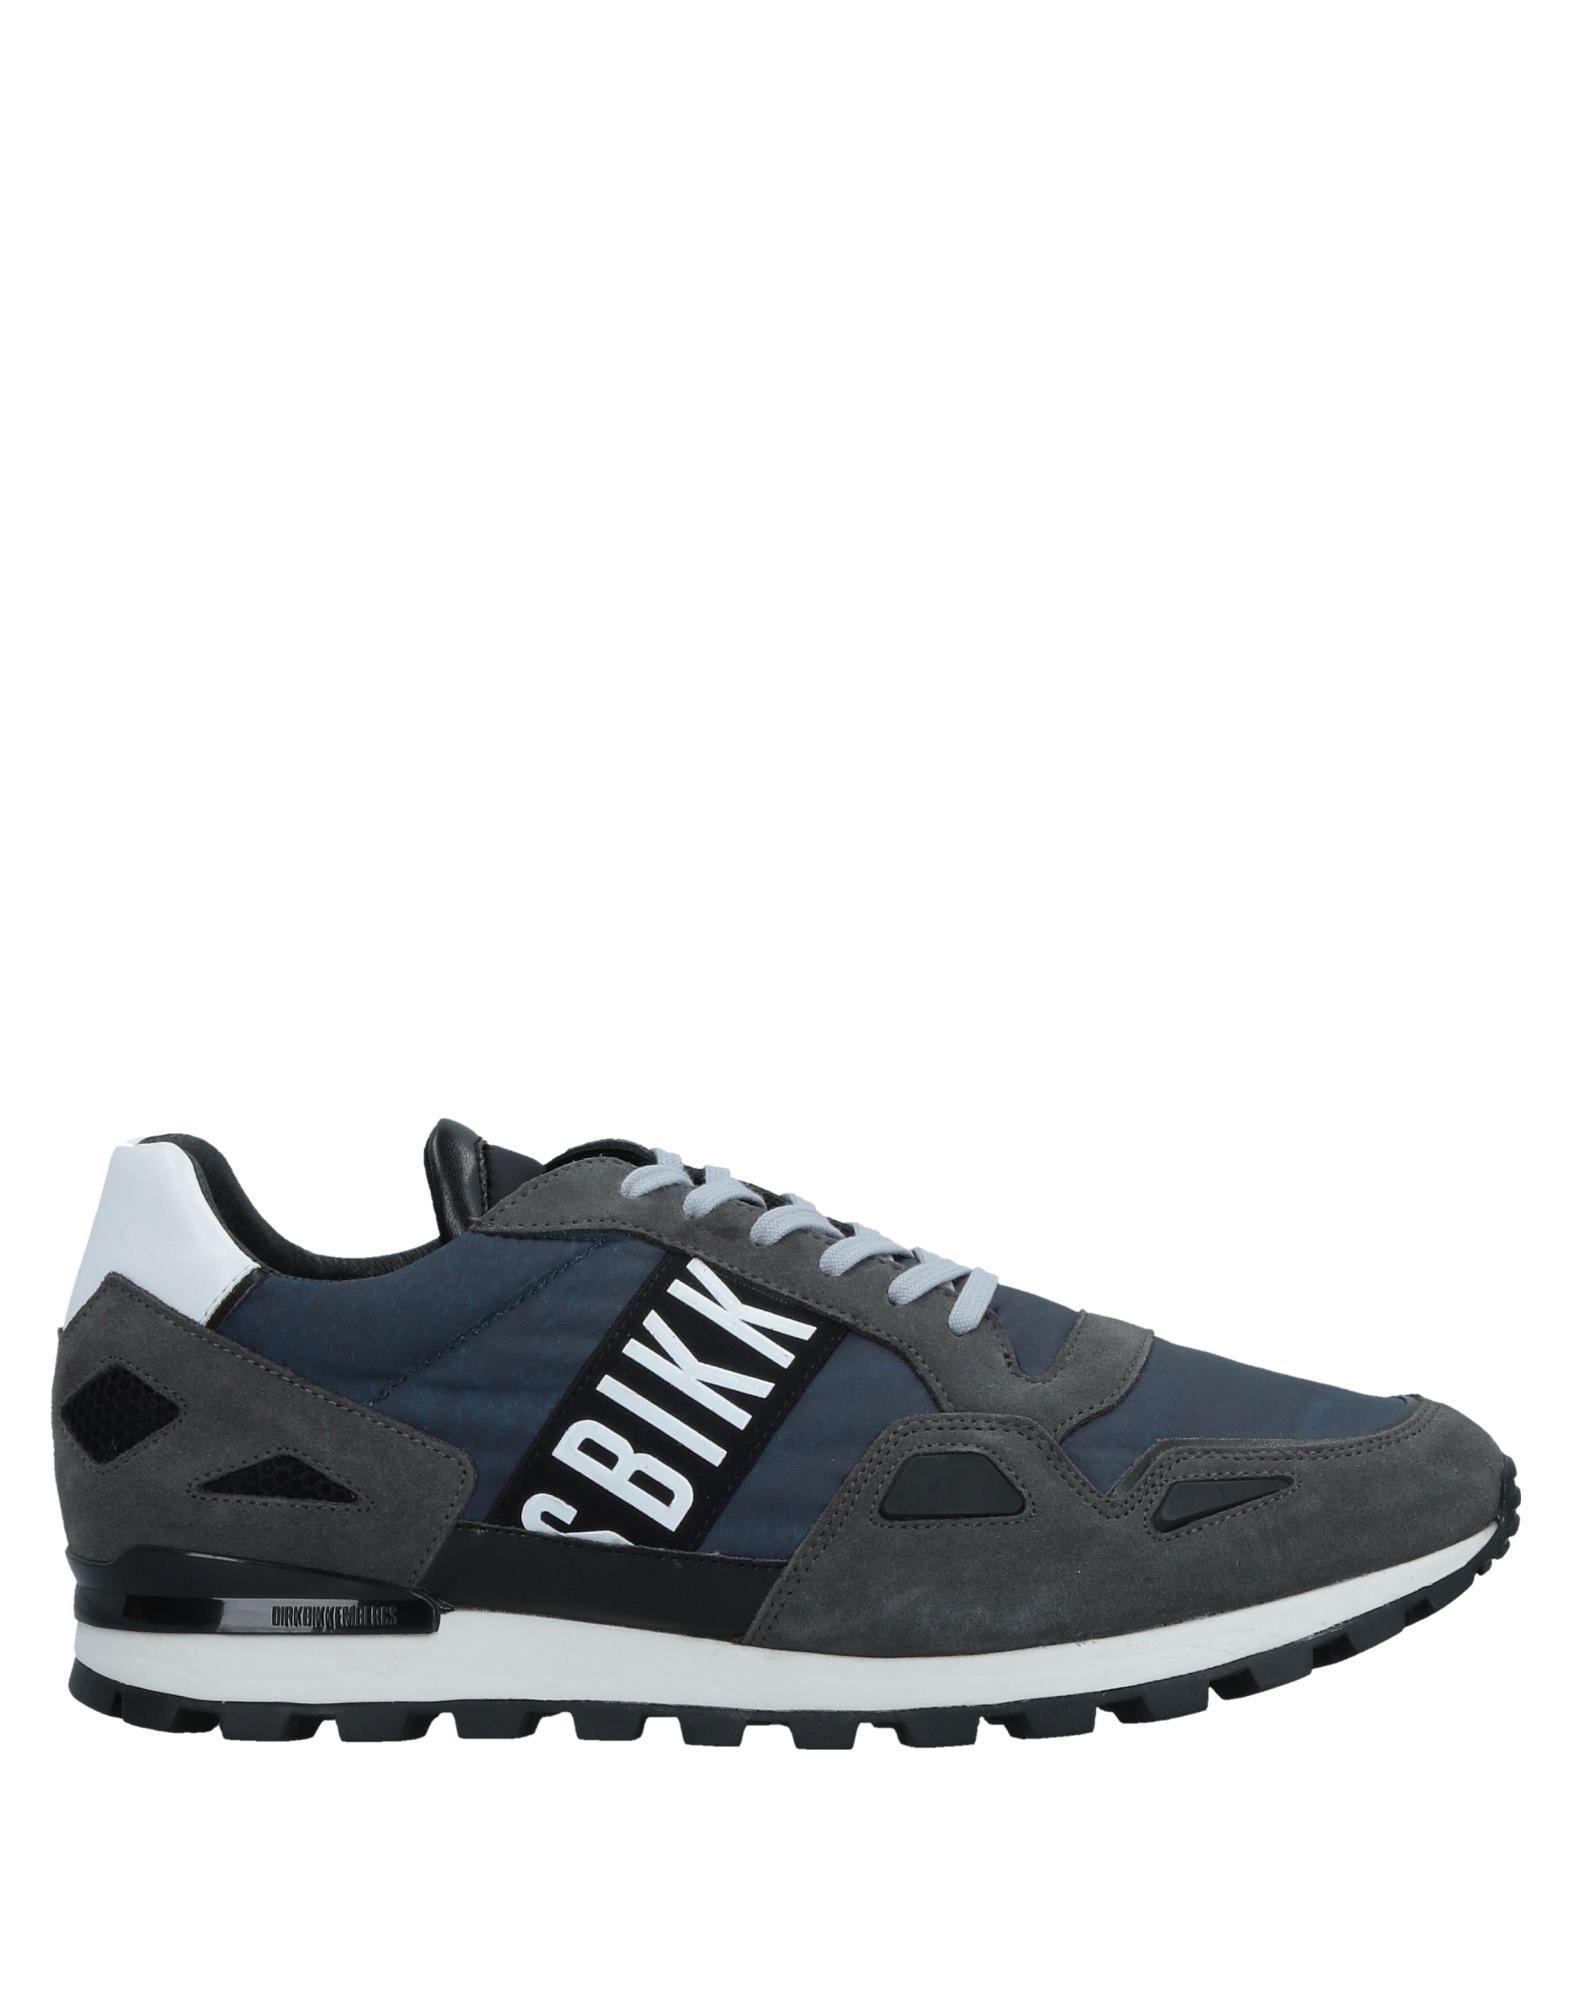 Moda Sneakers Bikkembergs Uomo - 11517154EX 11517154EX - 5d96f9